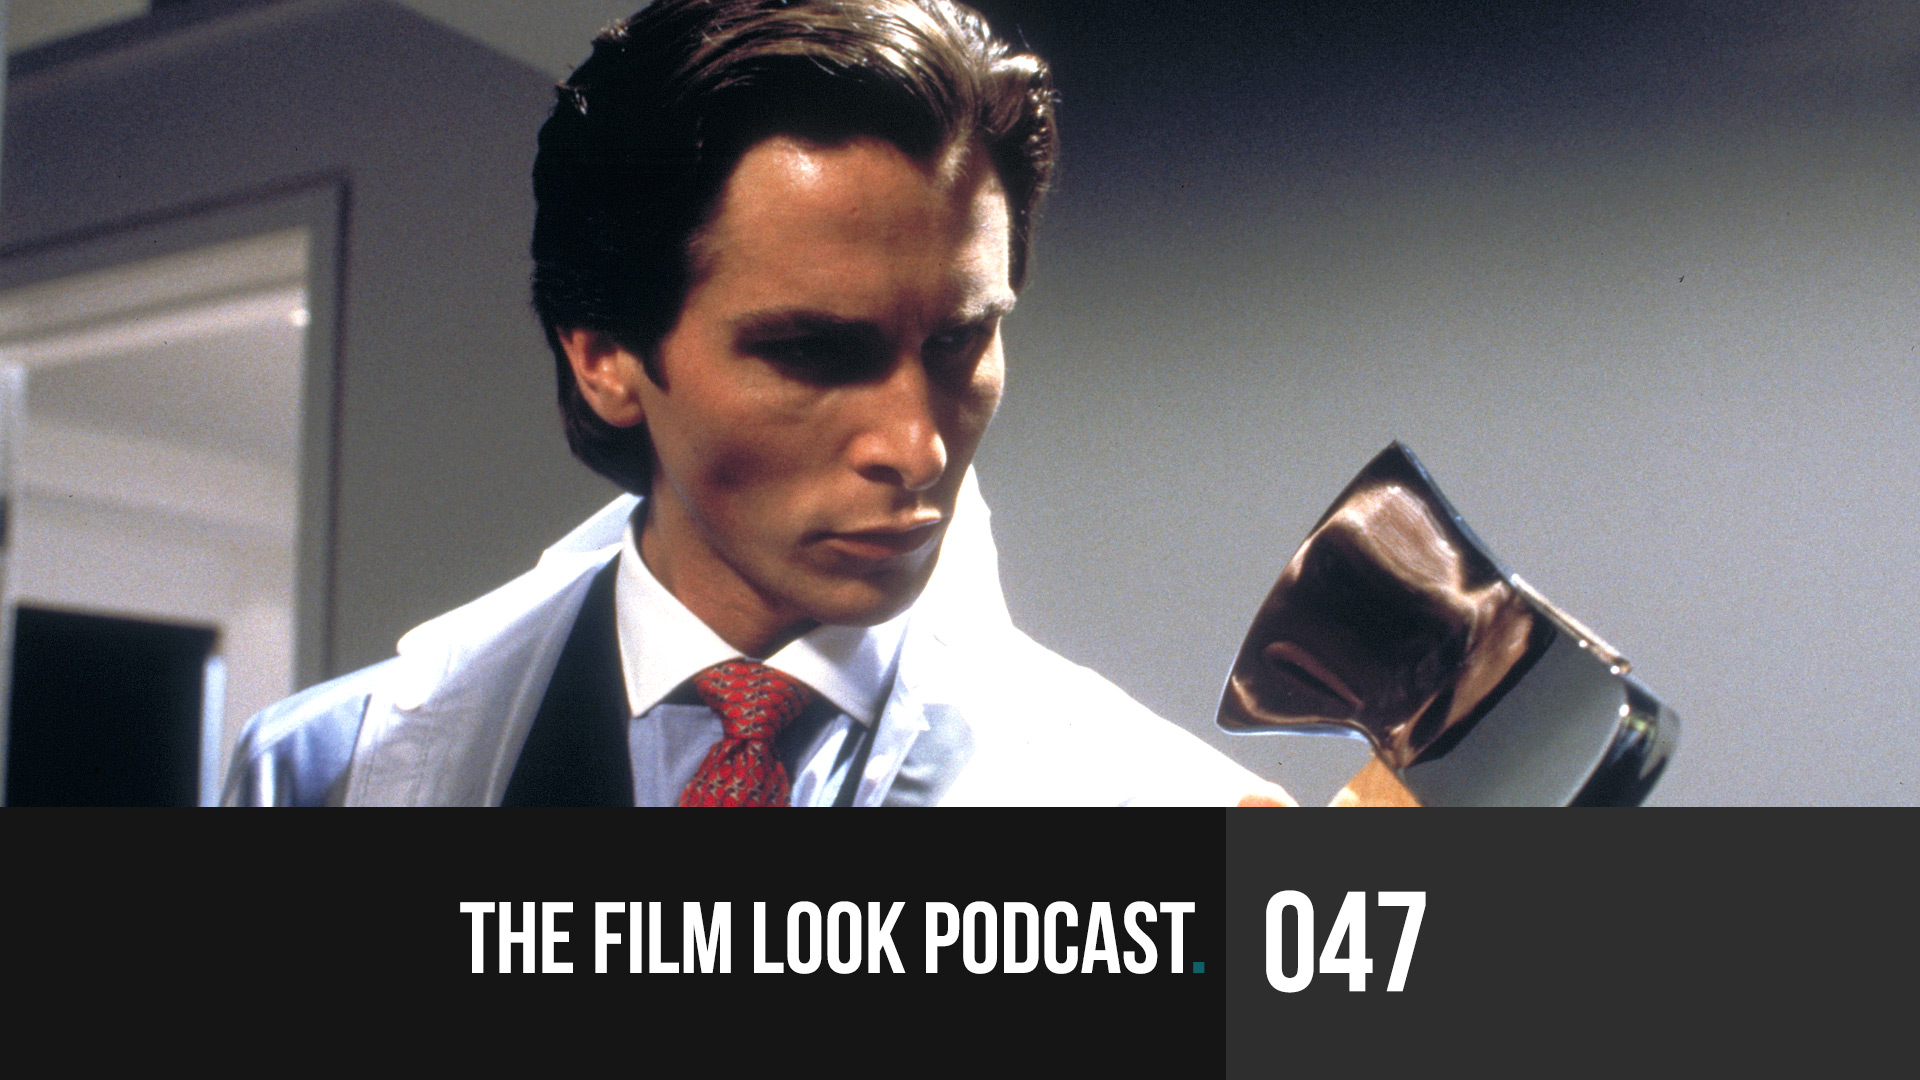 047-American-Psycho-Podcast.jpg